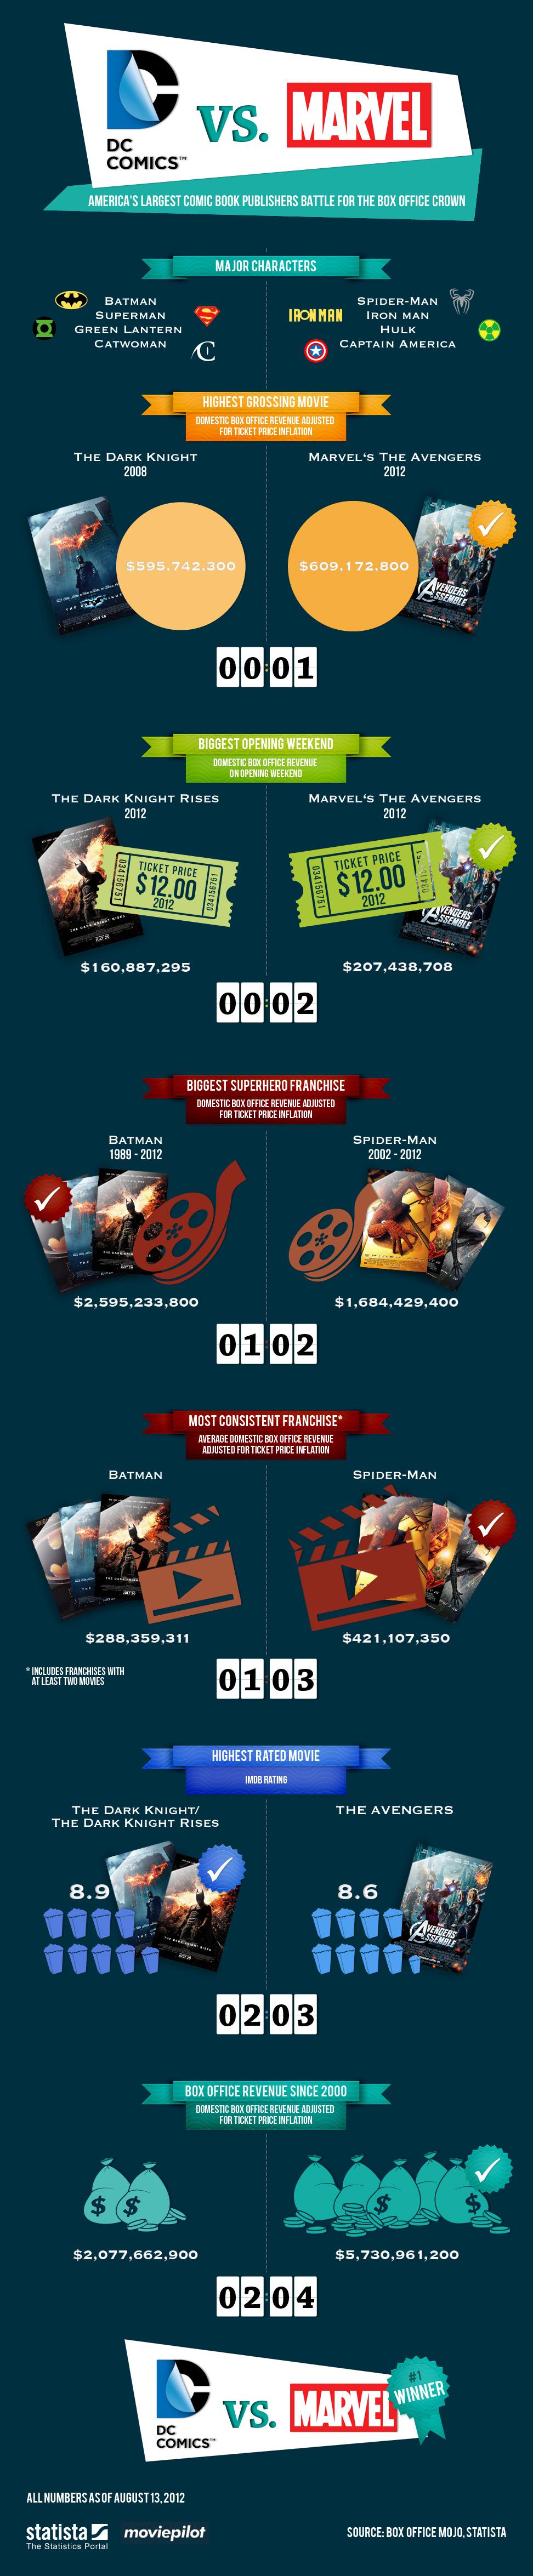 Infograf%C3%ADa-DC-Comics-VS-Marvel-http-www-onedigital-mx-ww-infografia-dc-comics-vs-mar-wallpaper-wp3007174